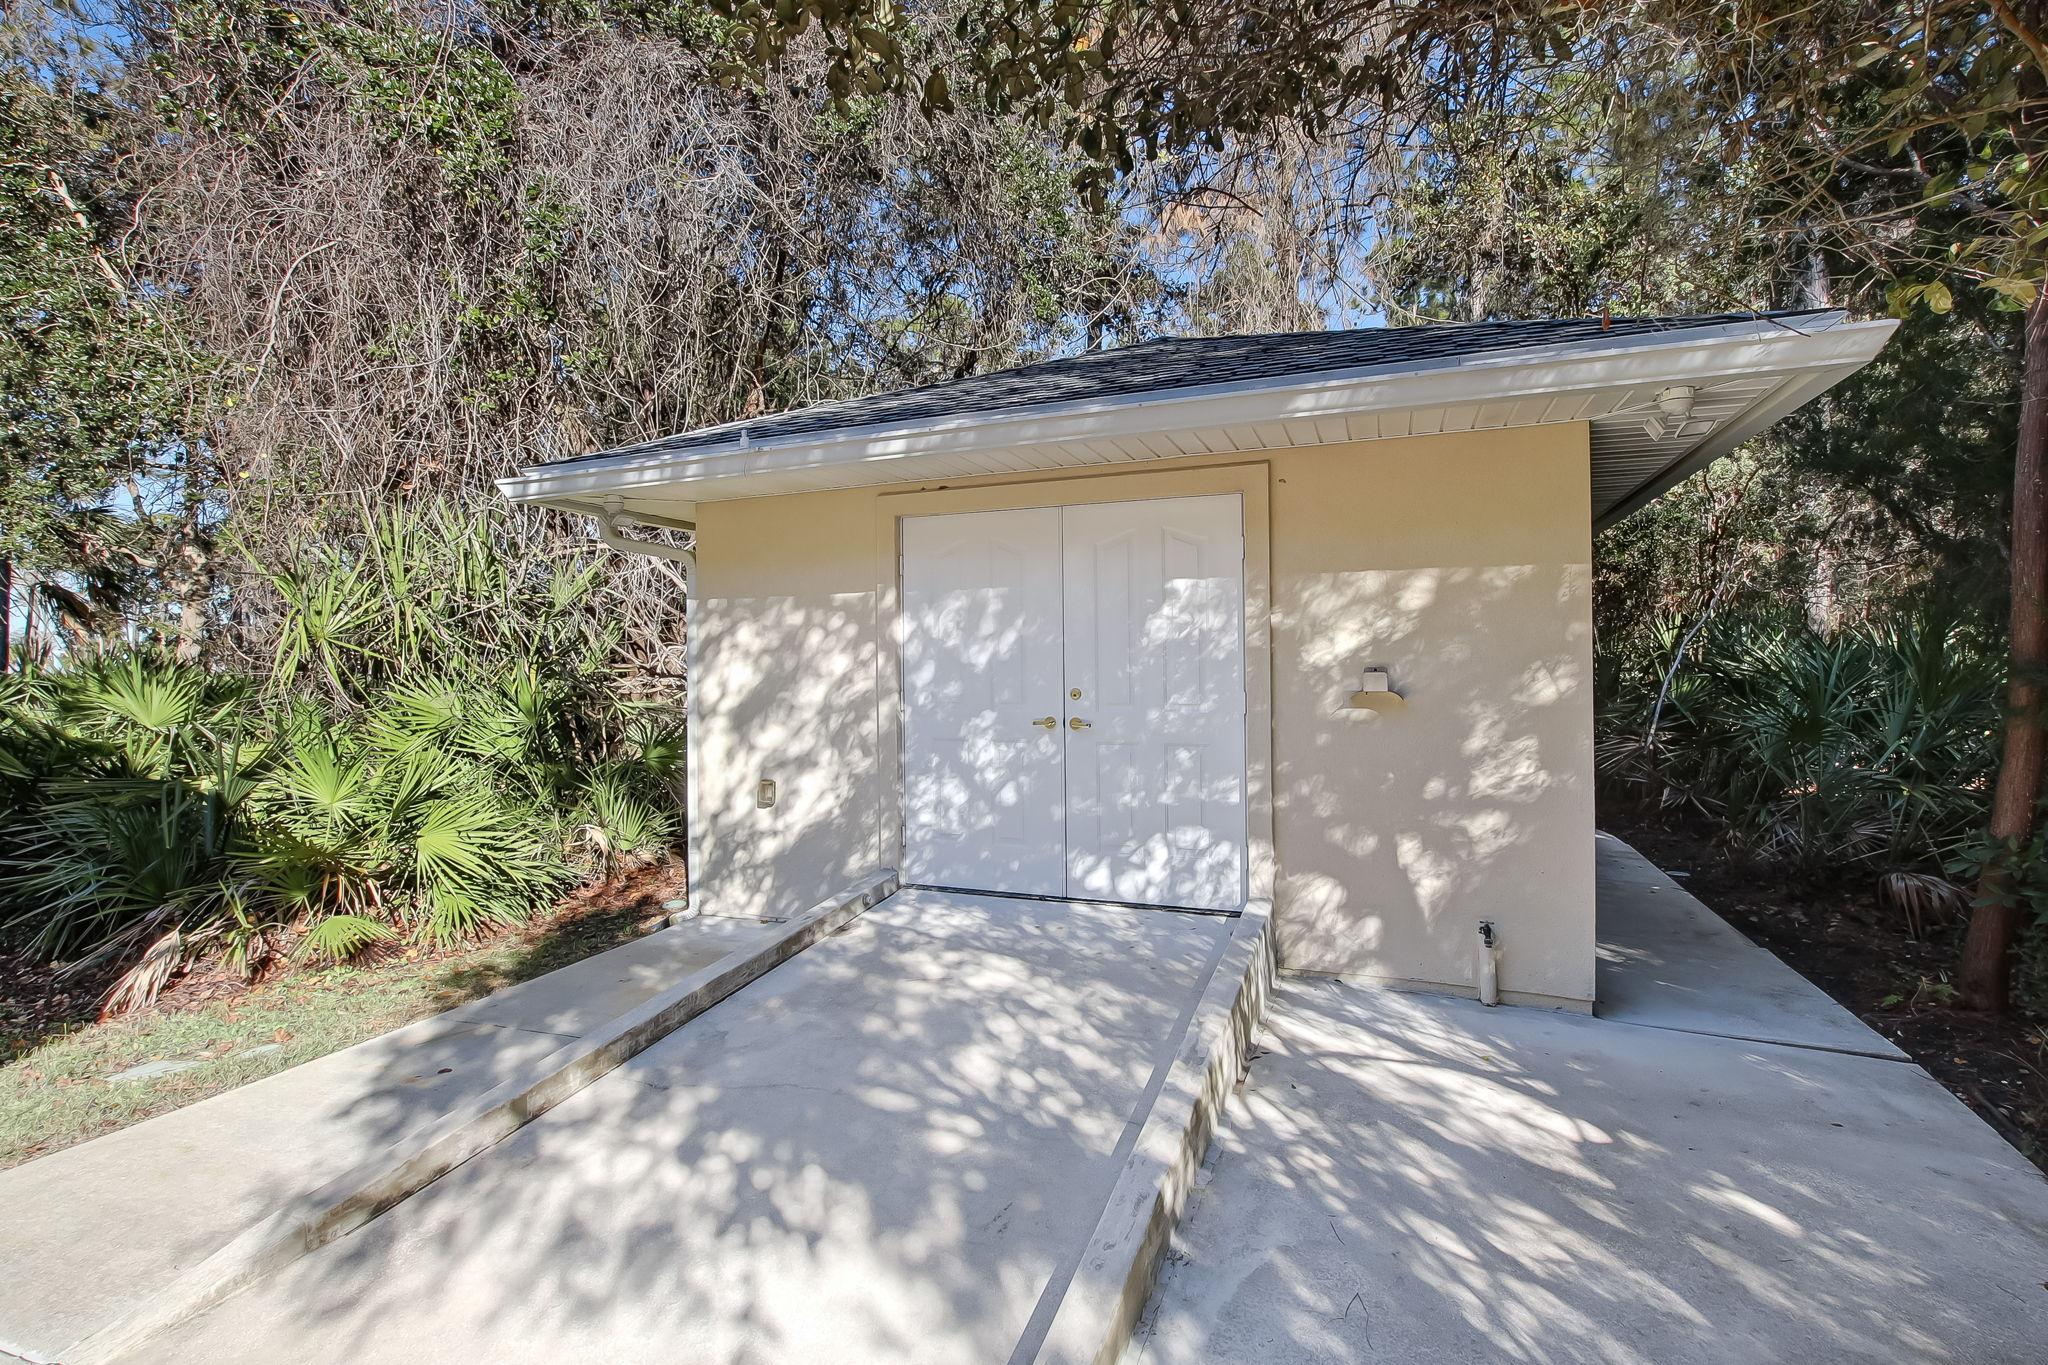 Storage-outside utility room/pumphouse